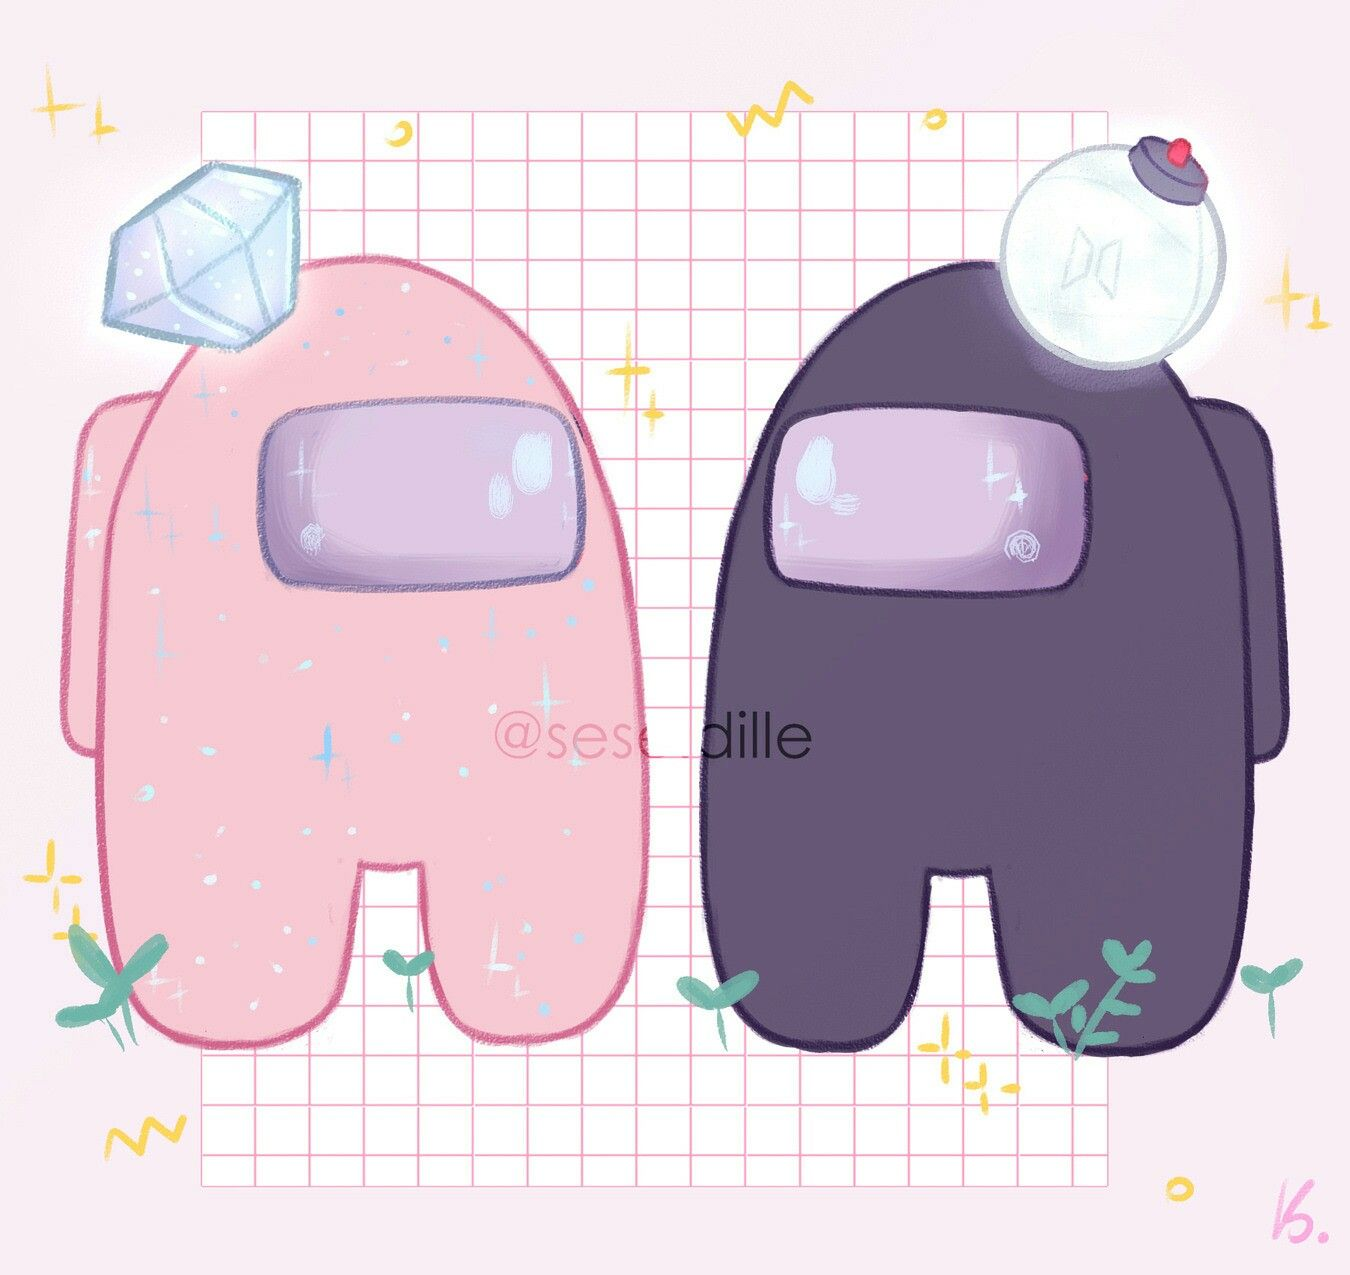 Among Us Cute Cartoon Wallpapers Wallpaper Iphone Cute Cute Stickers